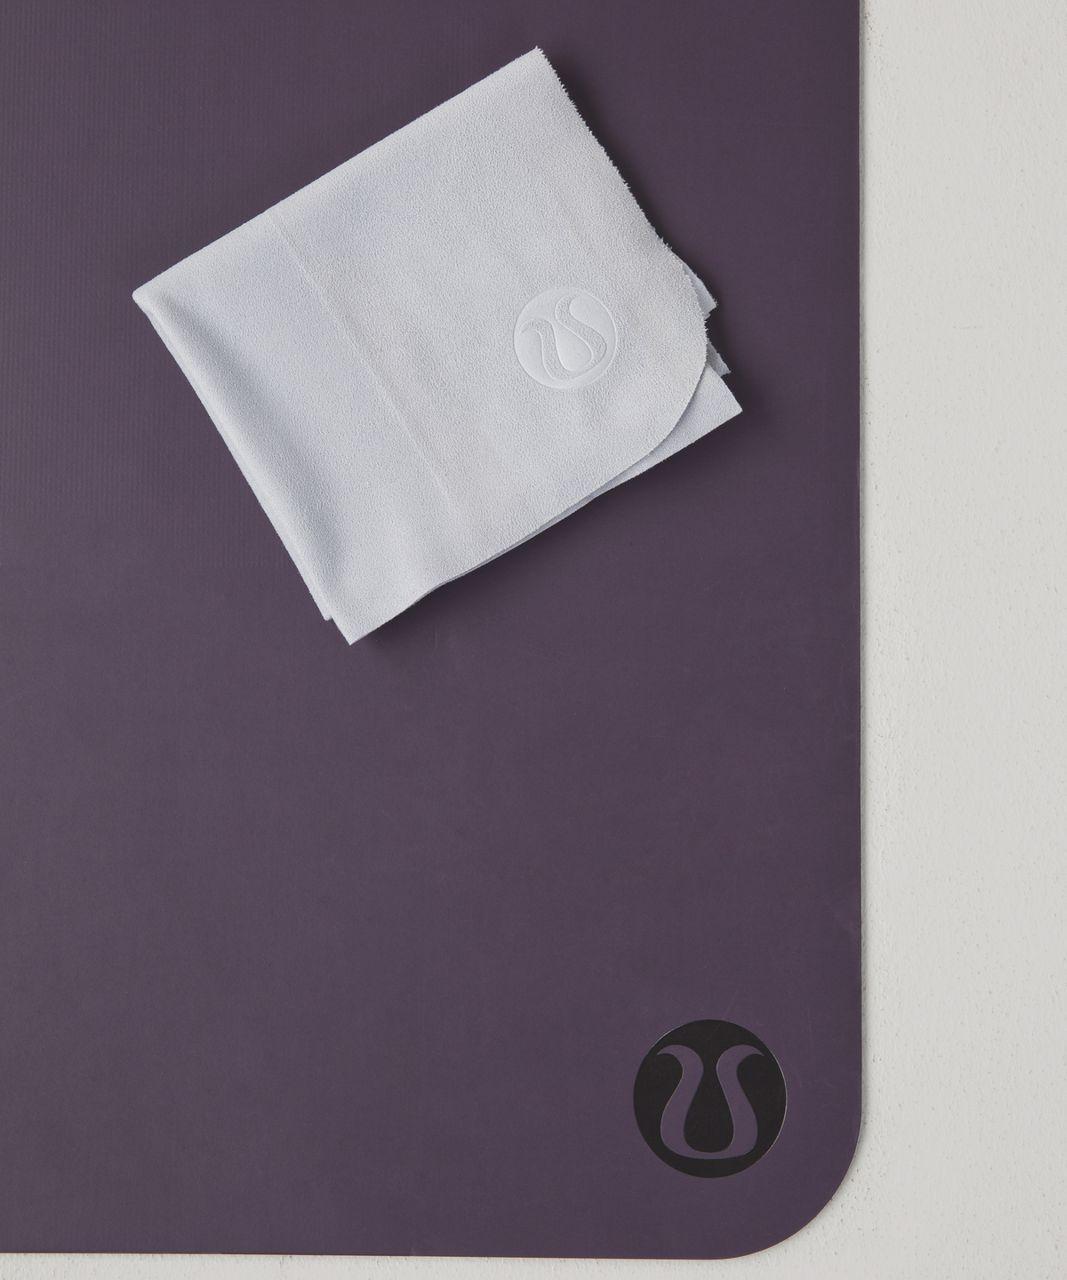 Lululemon The (Small) Towel - Fossil